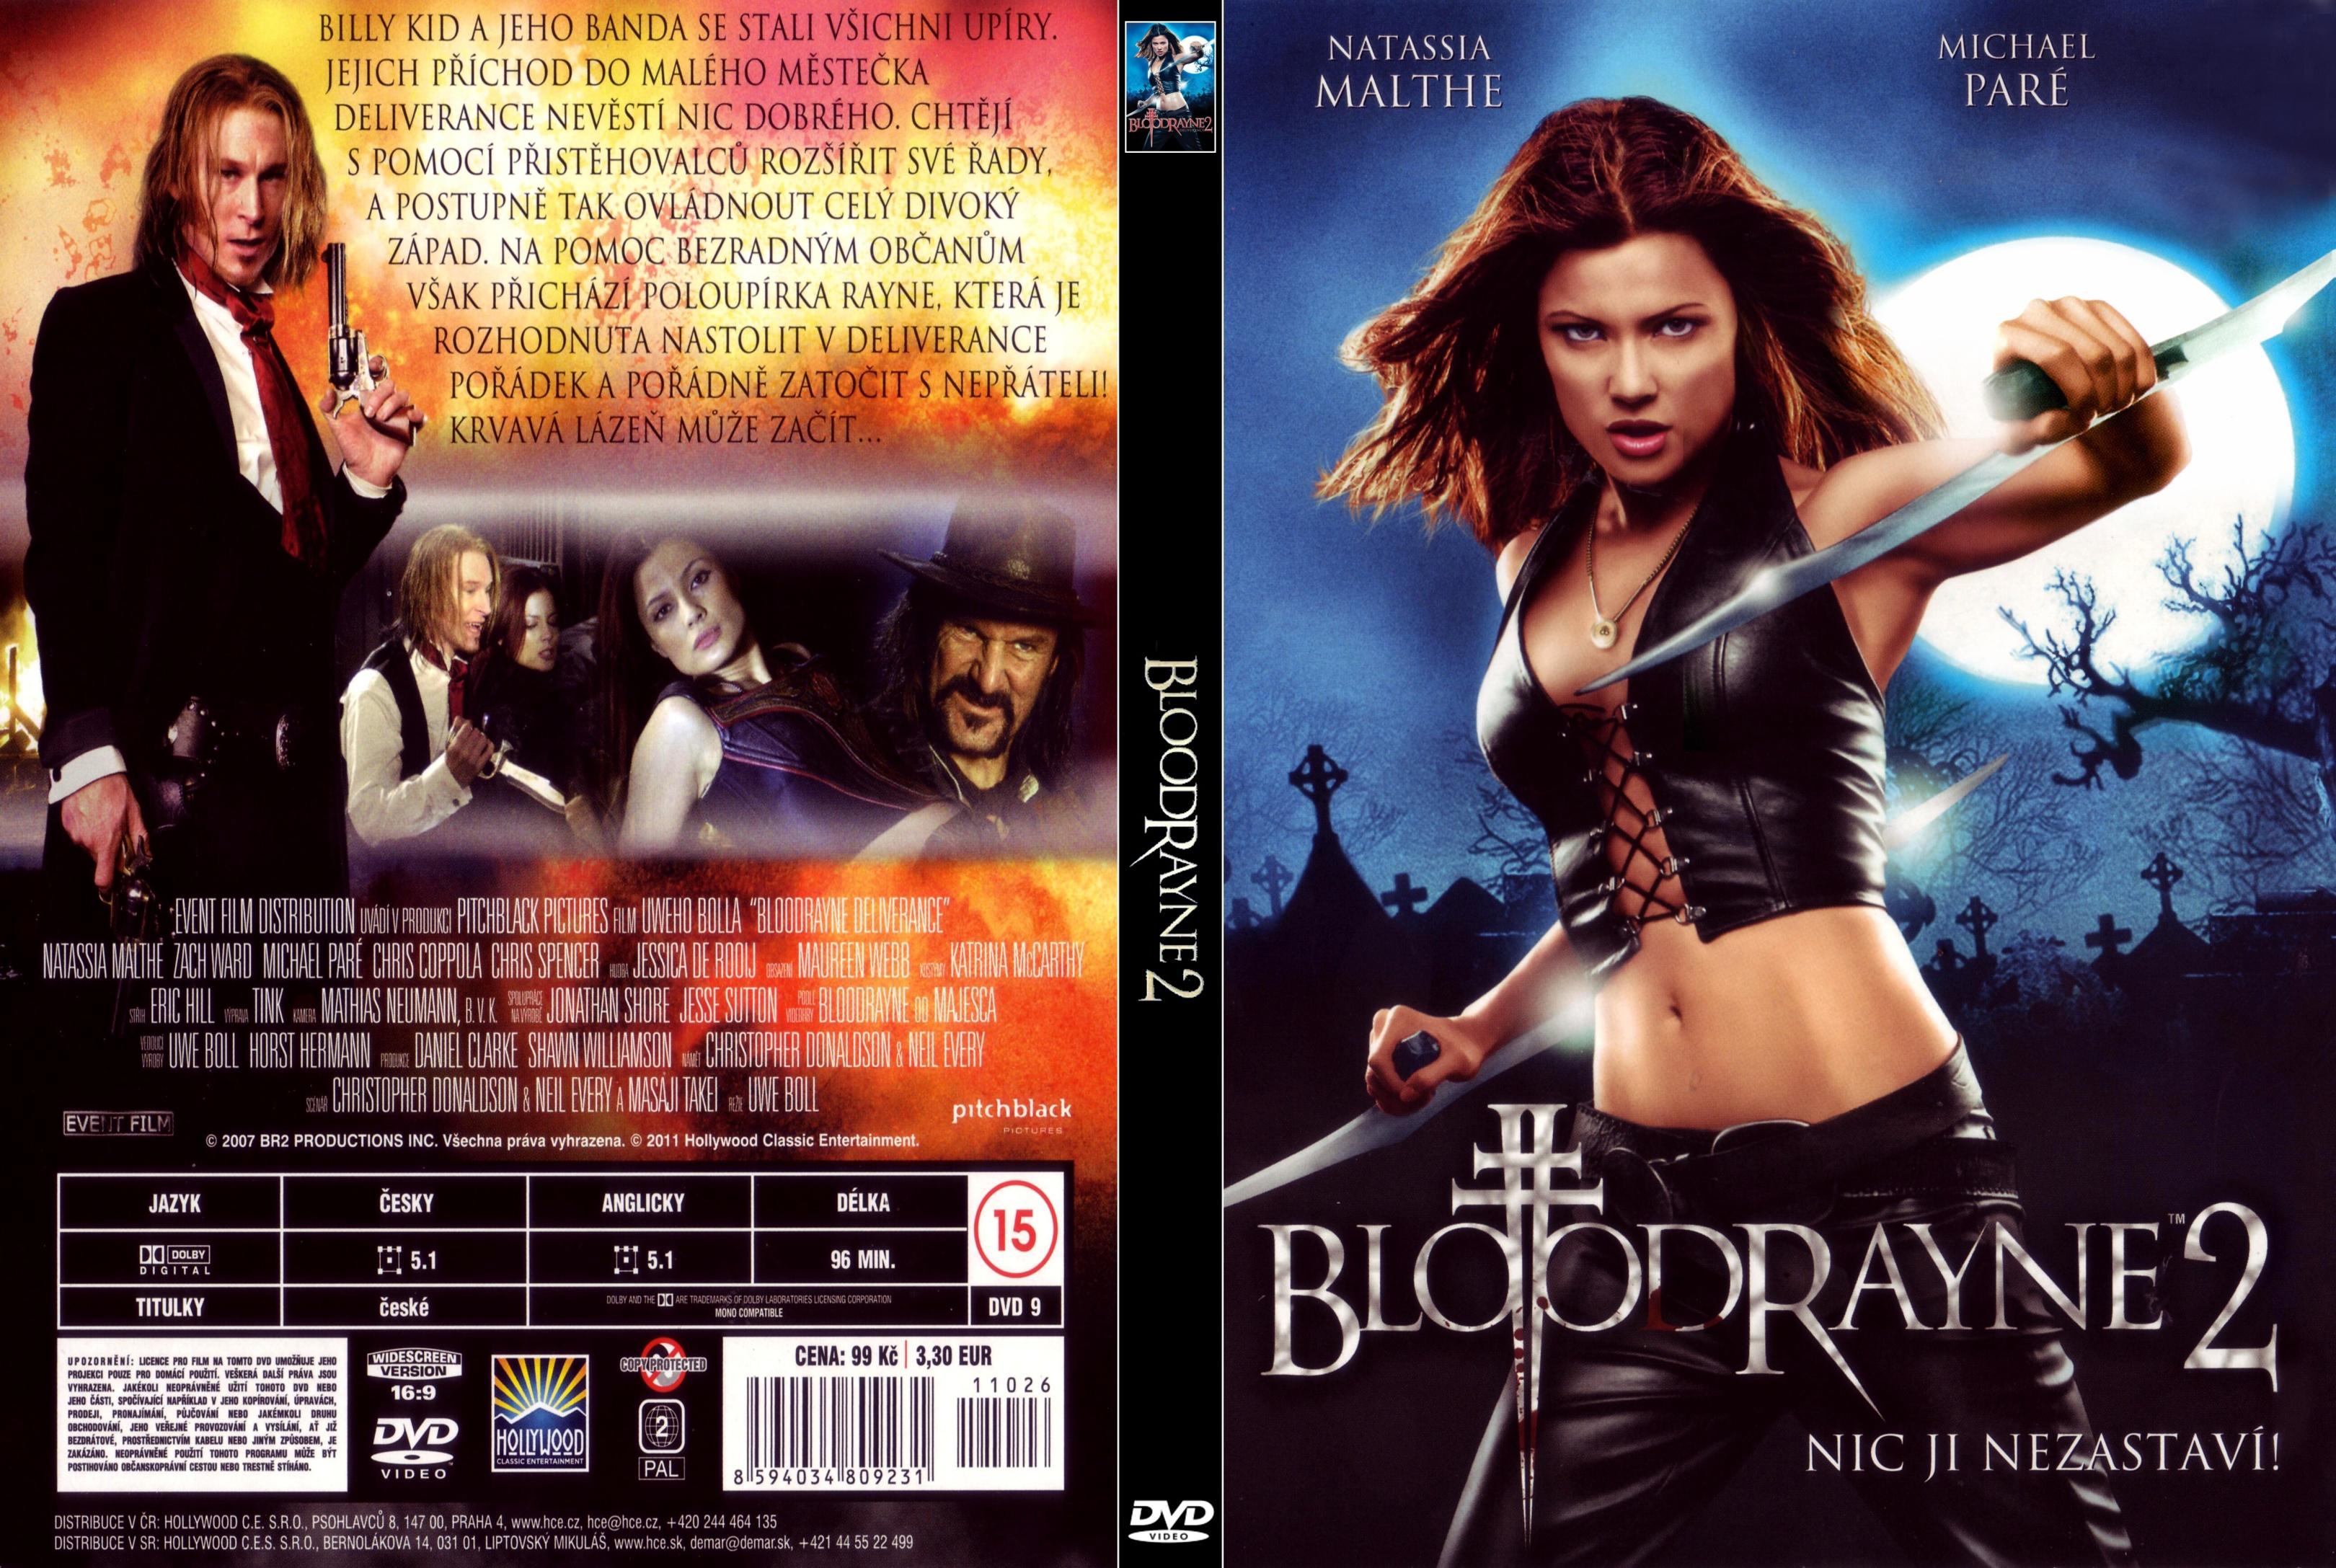 Bloodrayne Ii Deliverance Wallpapers Movie Hq Bloodrayne Ii